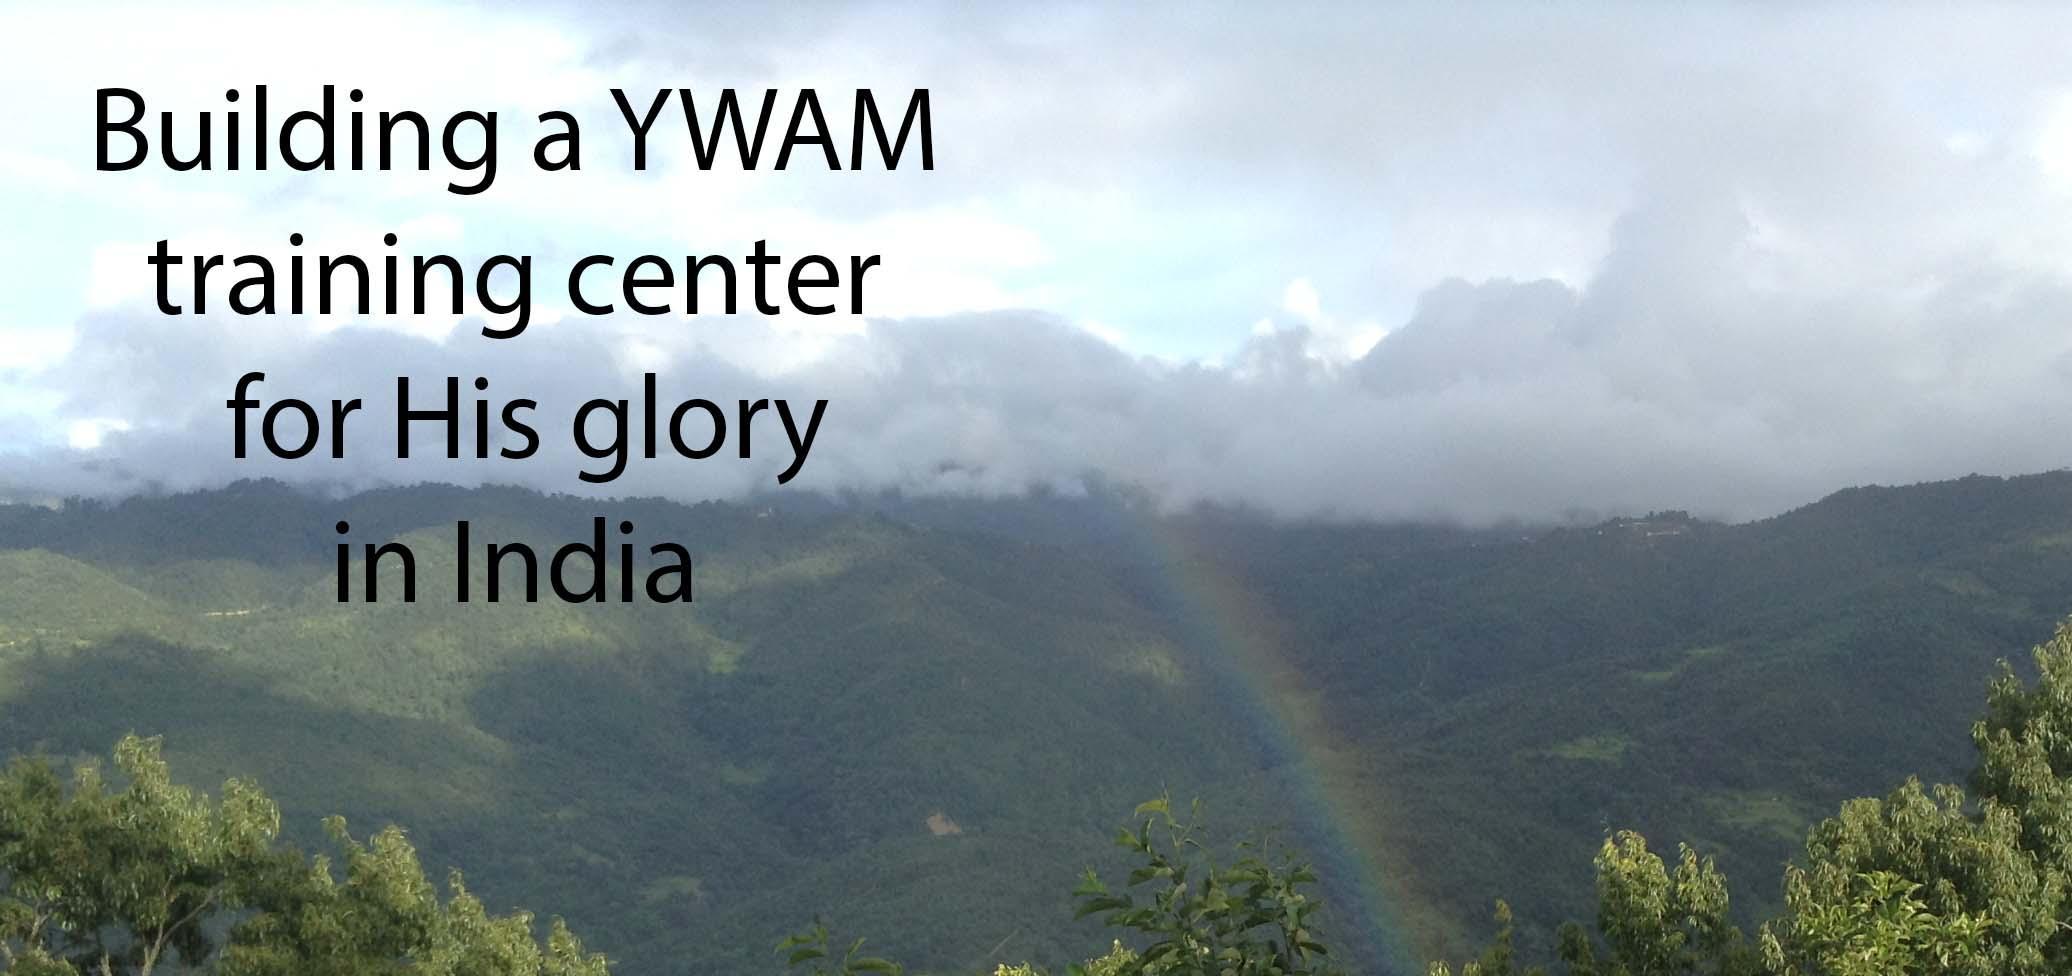 Building a YWAM Discipelship Training Center Fundraising